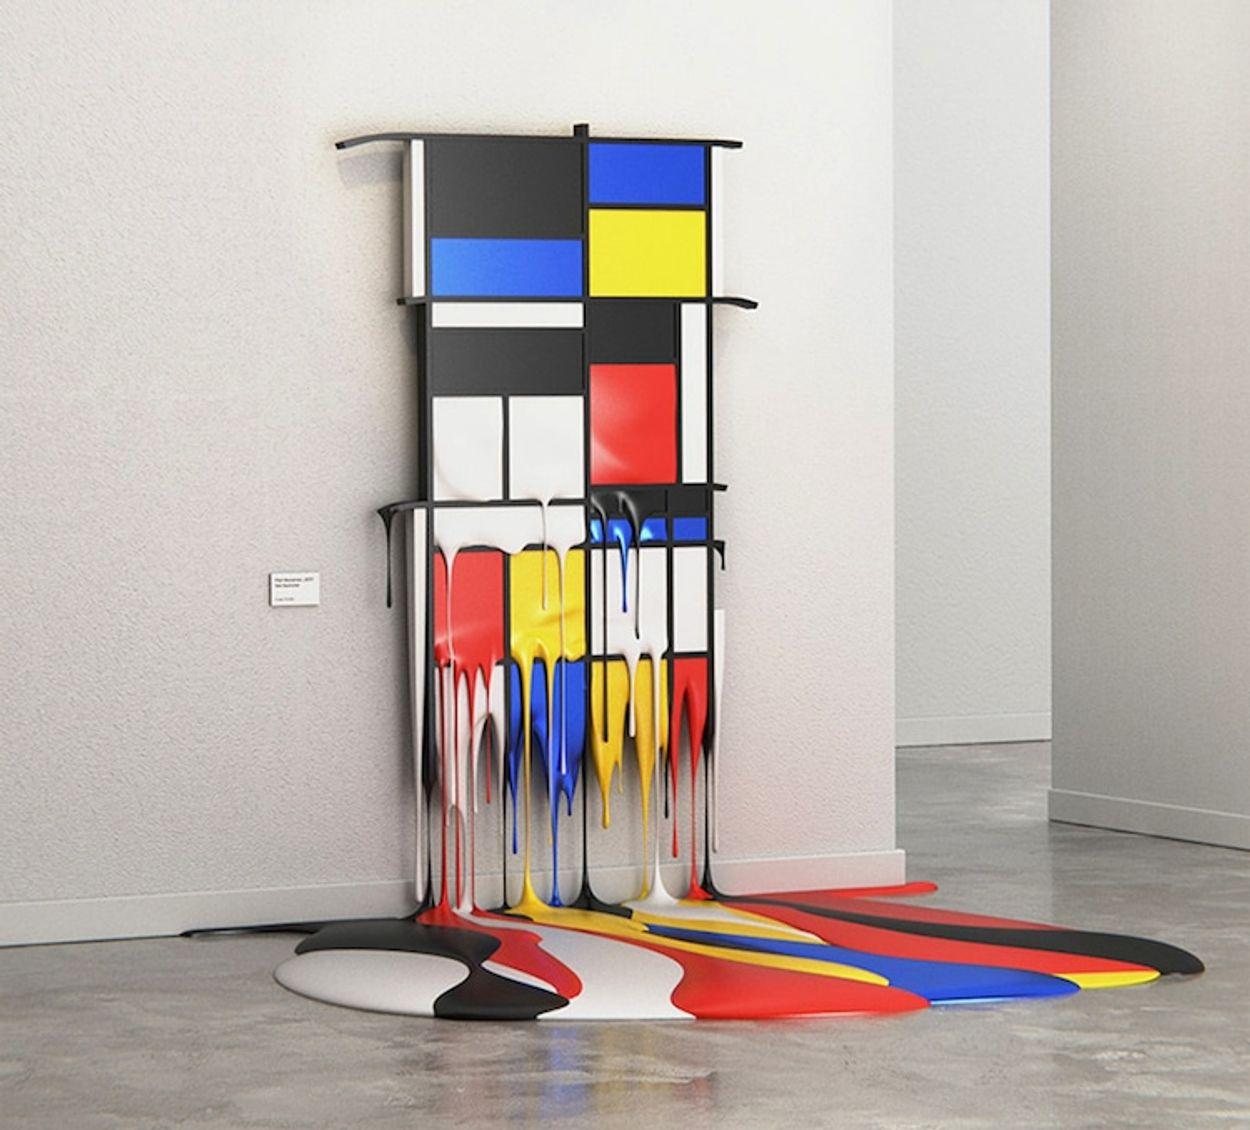 melting-masterpieces-digital-art-alper-dostal-1